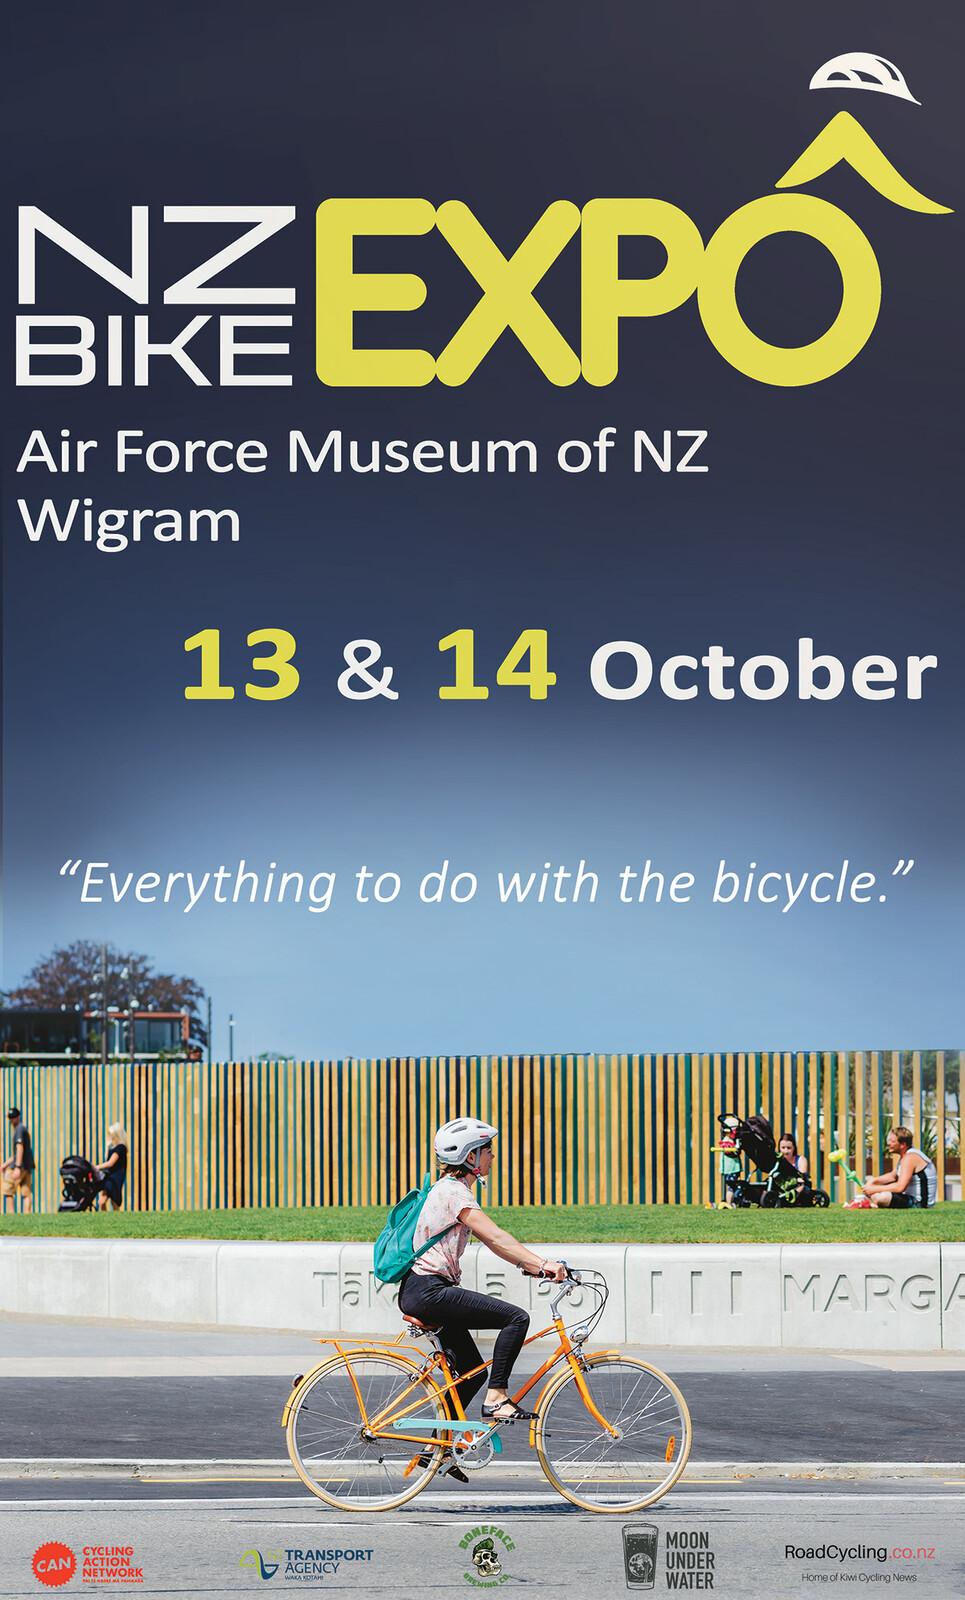 NZ Bike Expo Trailer billboard 1